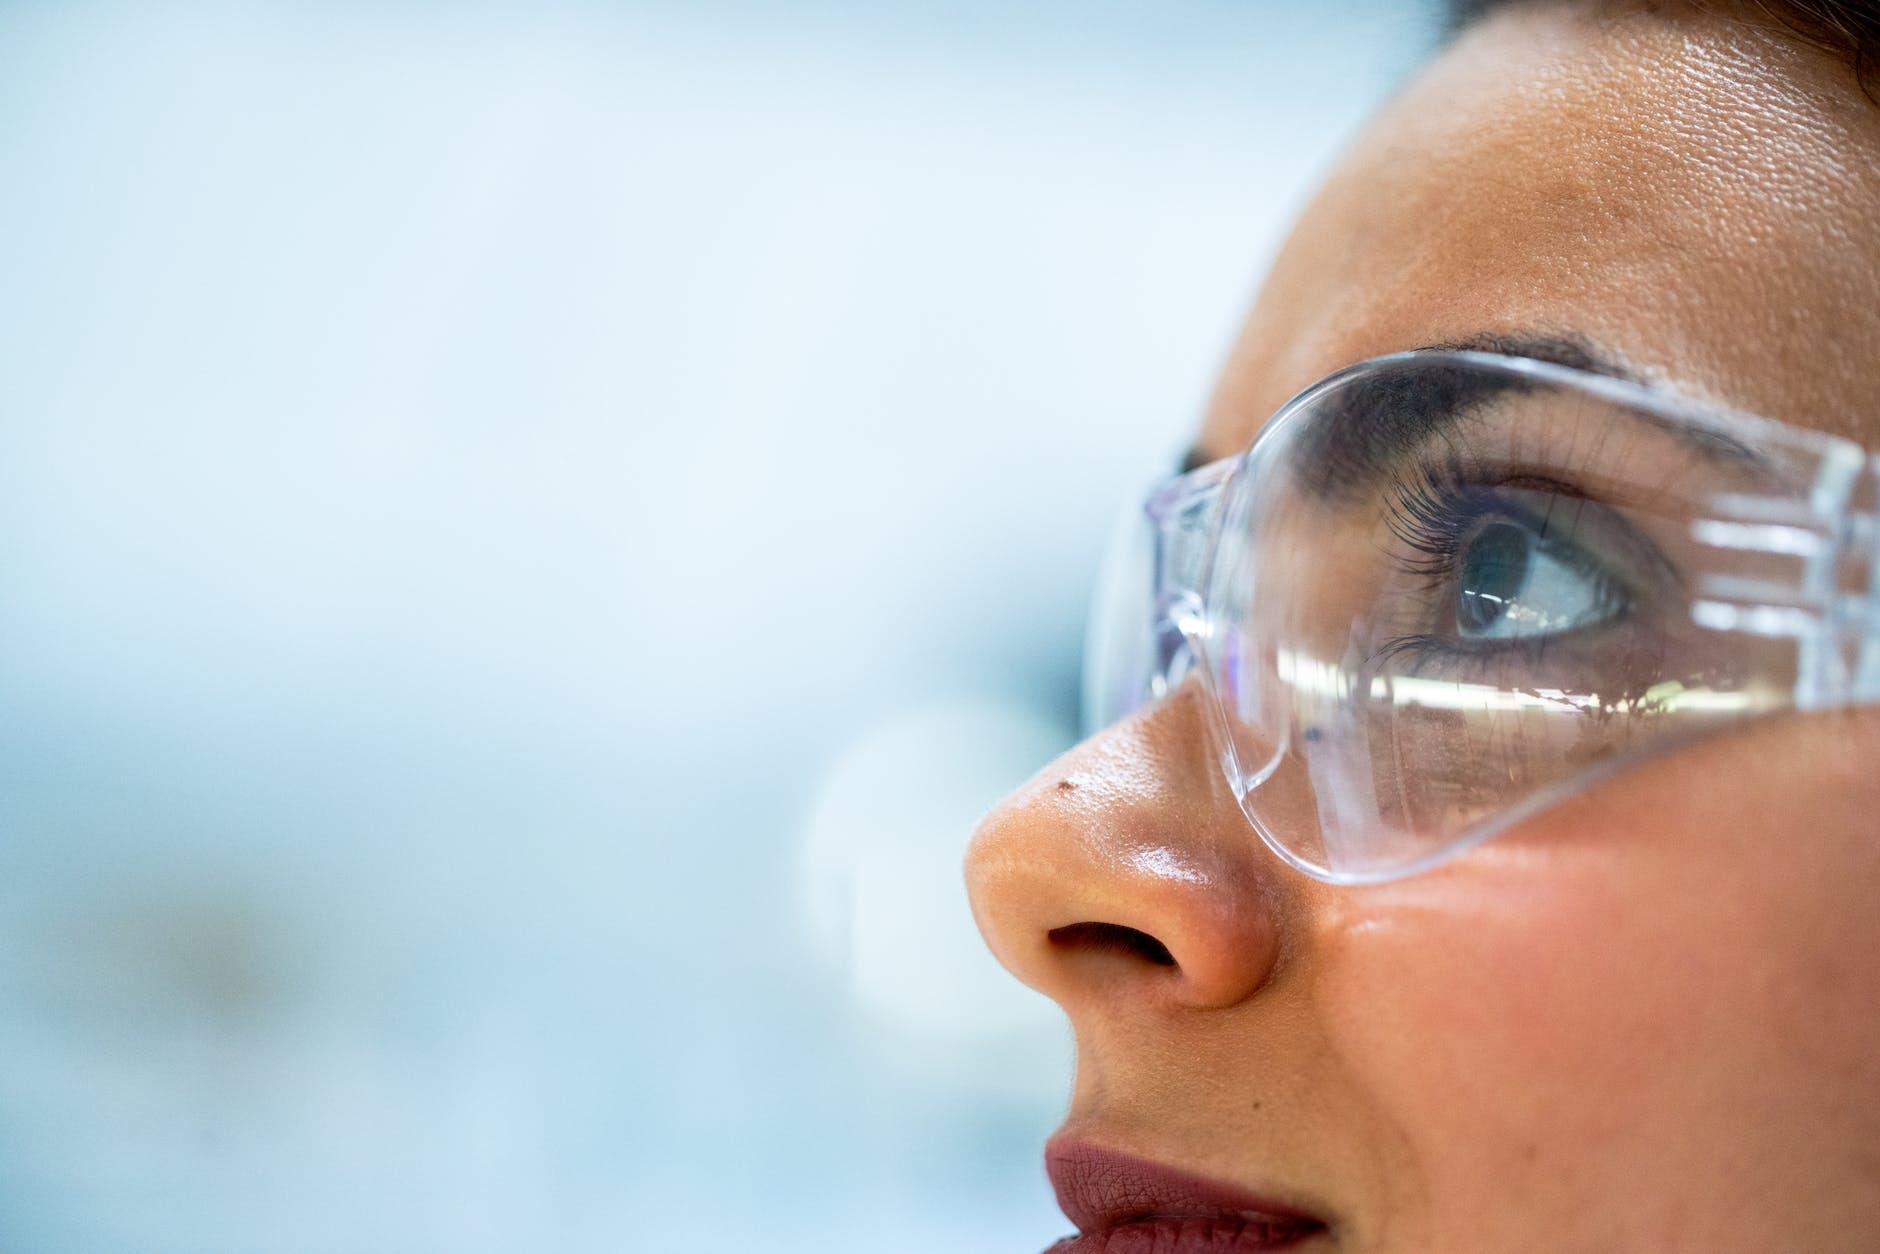 woman wearing plastic framed eyeglasses